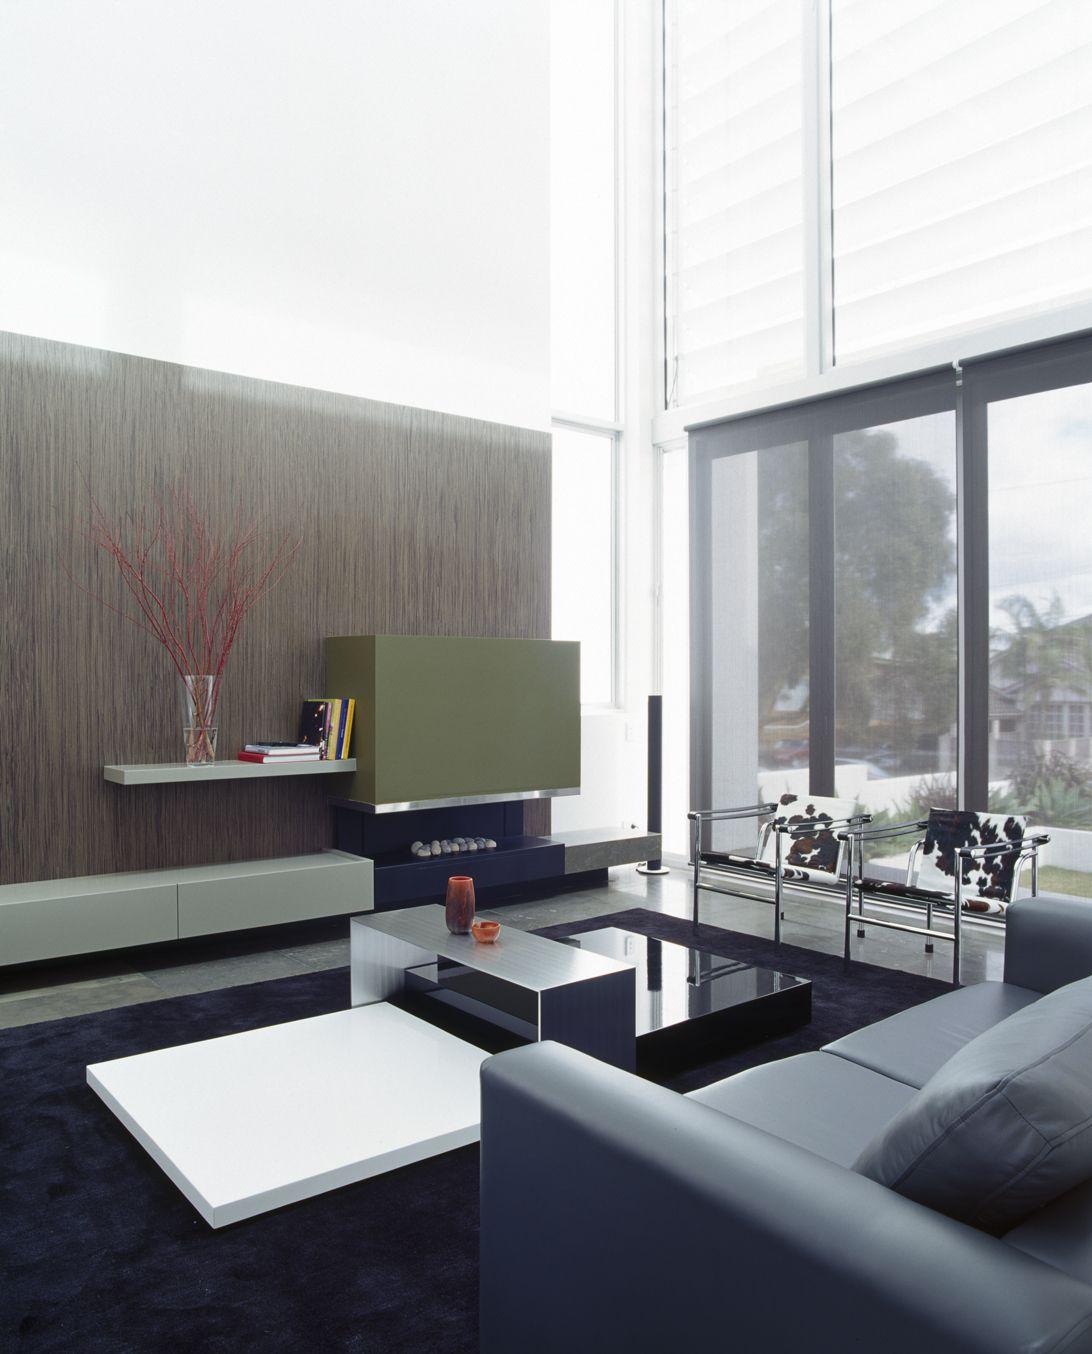 Http://www.minosadesign.com/2012/11/minosa Kitchen Design Award Winning.html  *Kitchen/Table: Cstm Designed/manuf   Minosa *cabinets: Reconstituted  Walnut ...